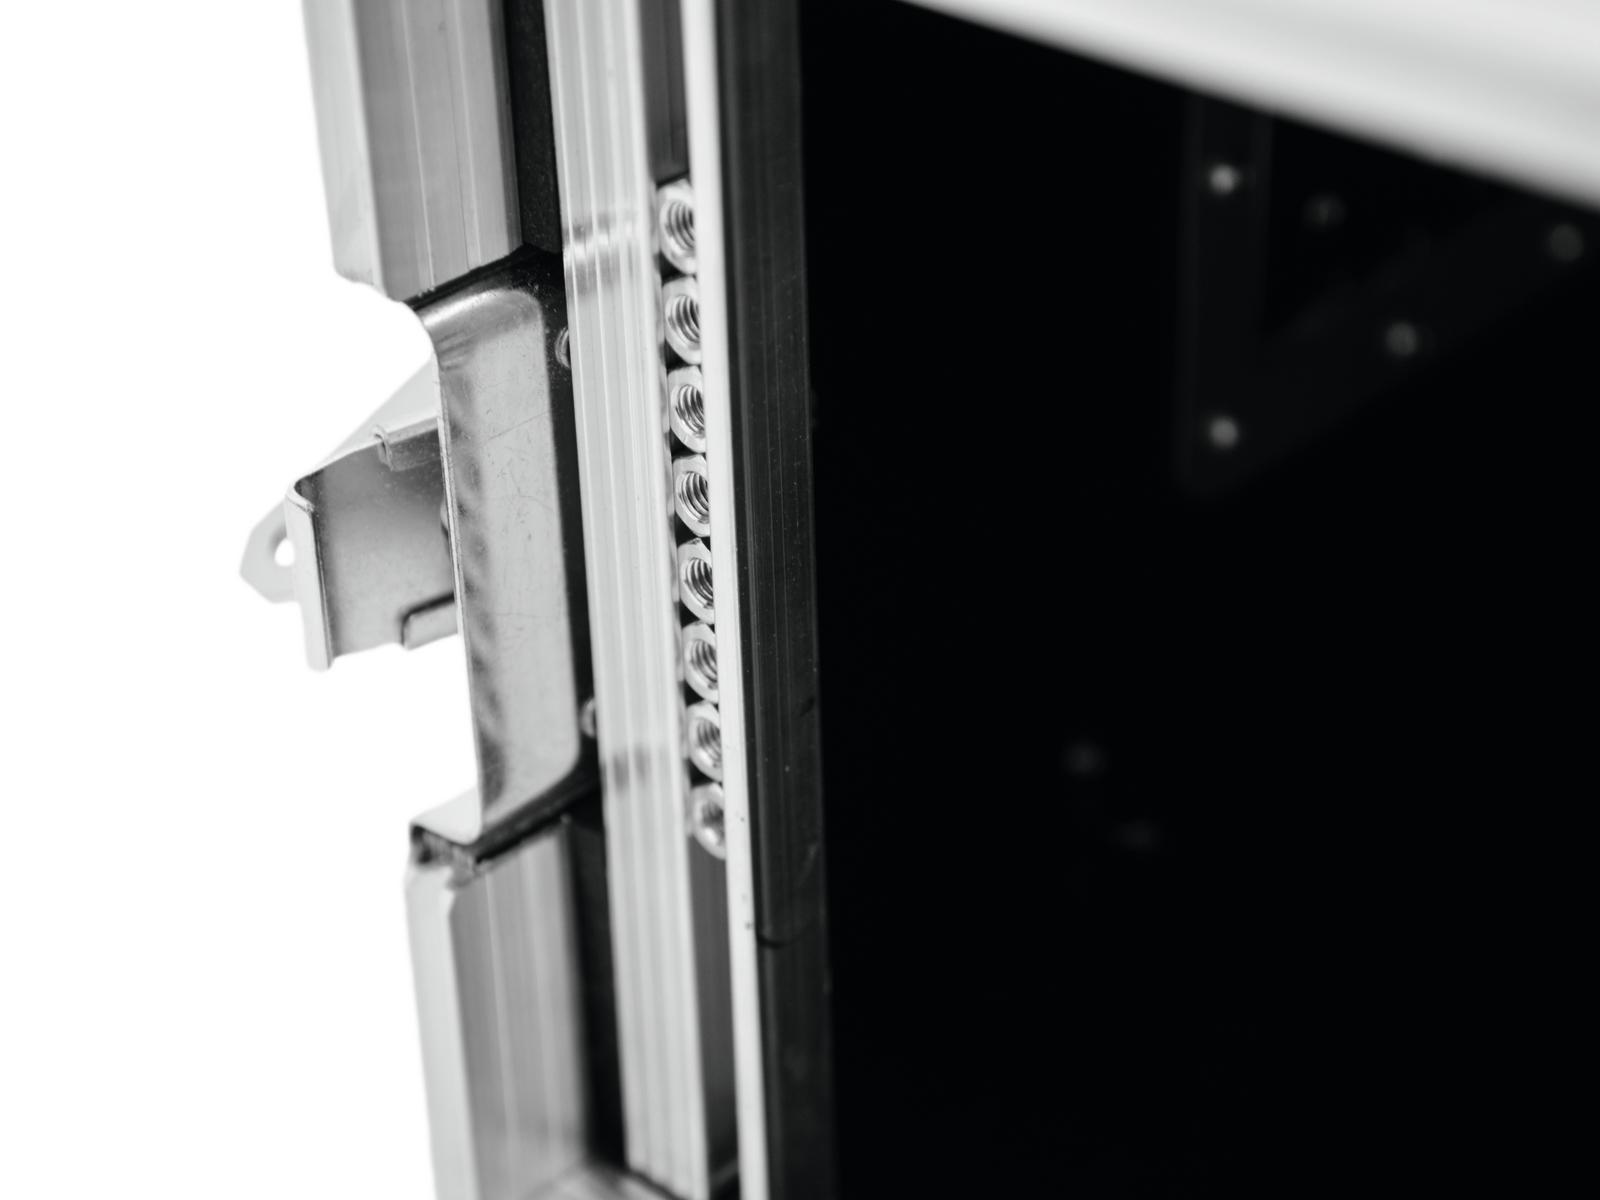 ROADINGER Rack Profi 8U 45cm